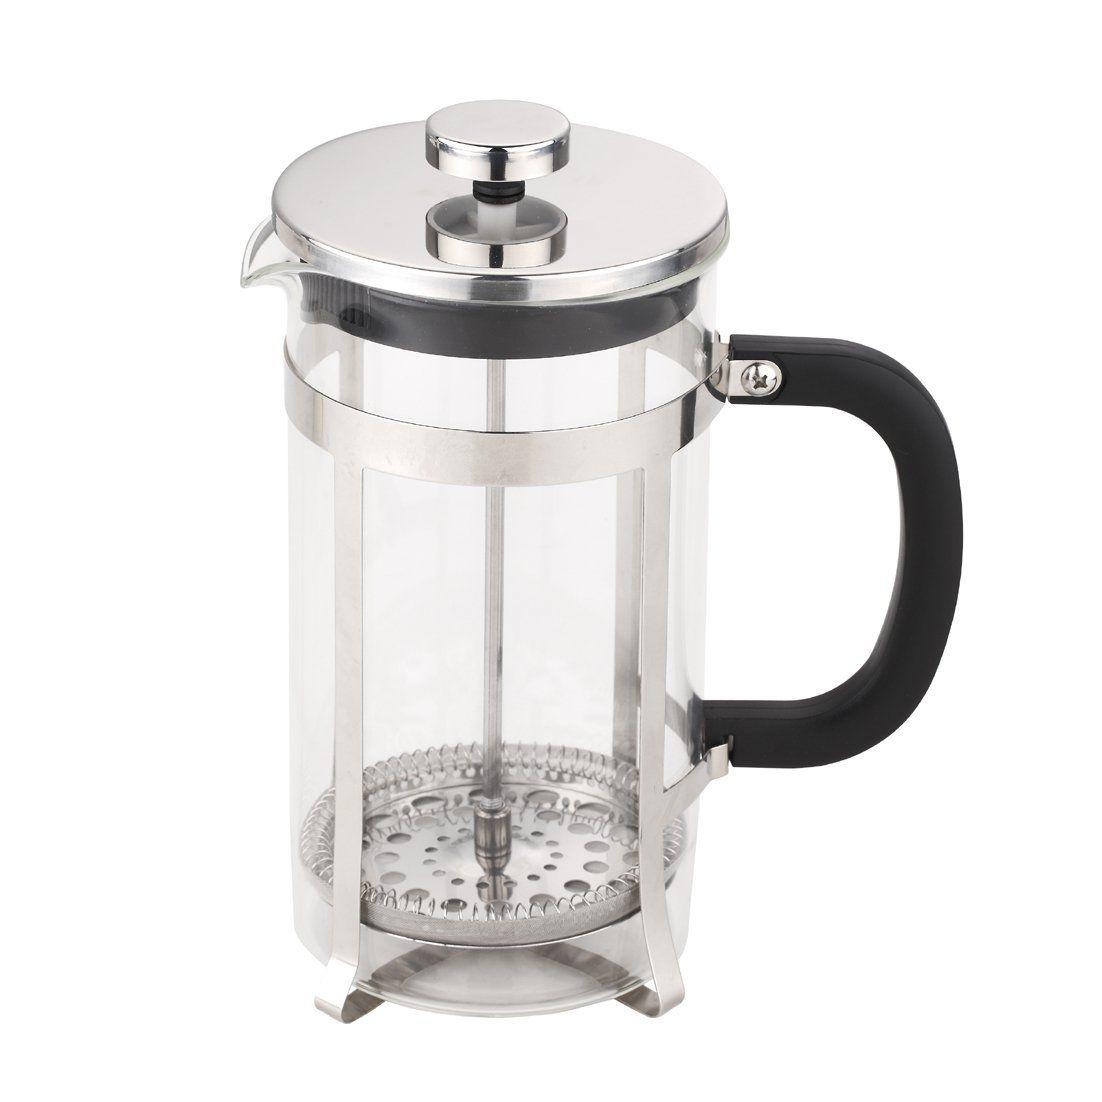 Classic French Press Coffee CoffeeMakerIdeas French